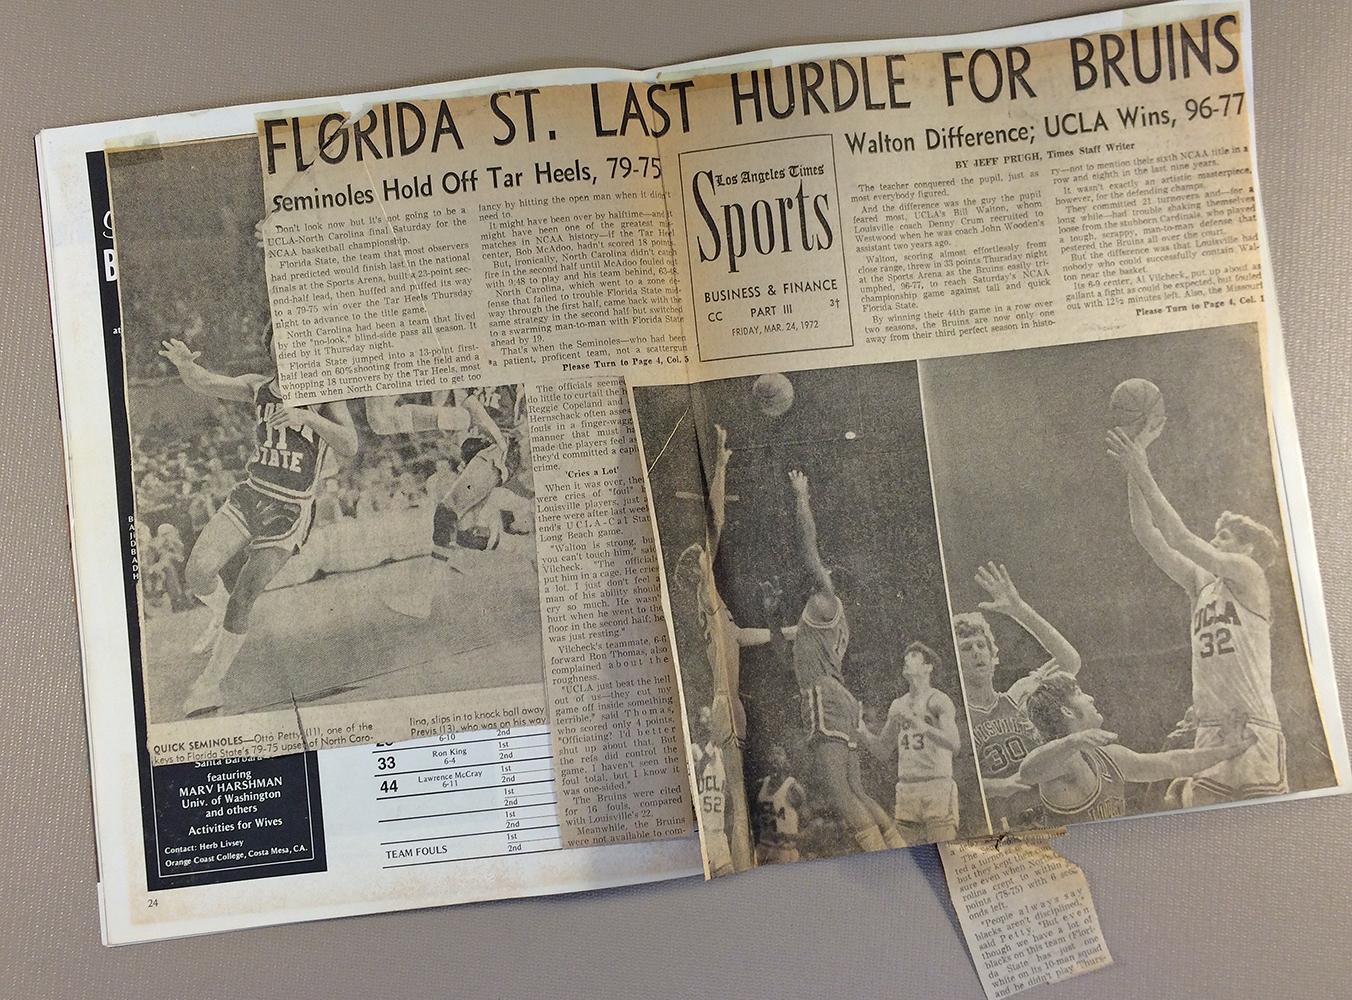 basketball_ncaa_1972_final_four_programsB.jpg